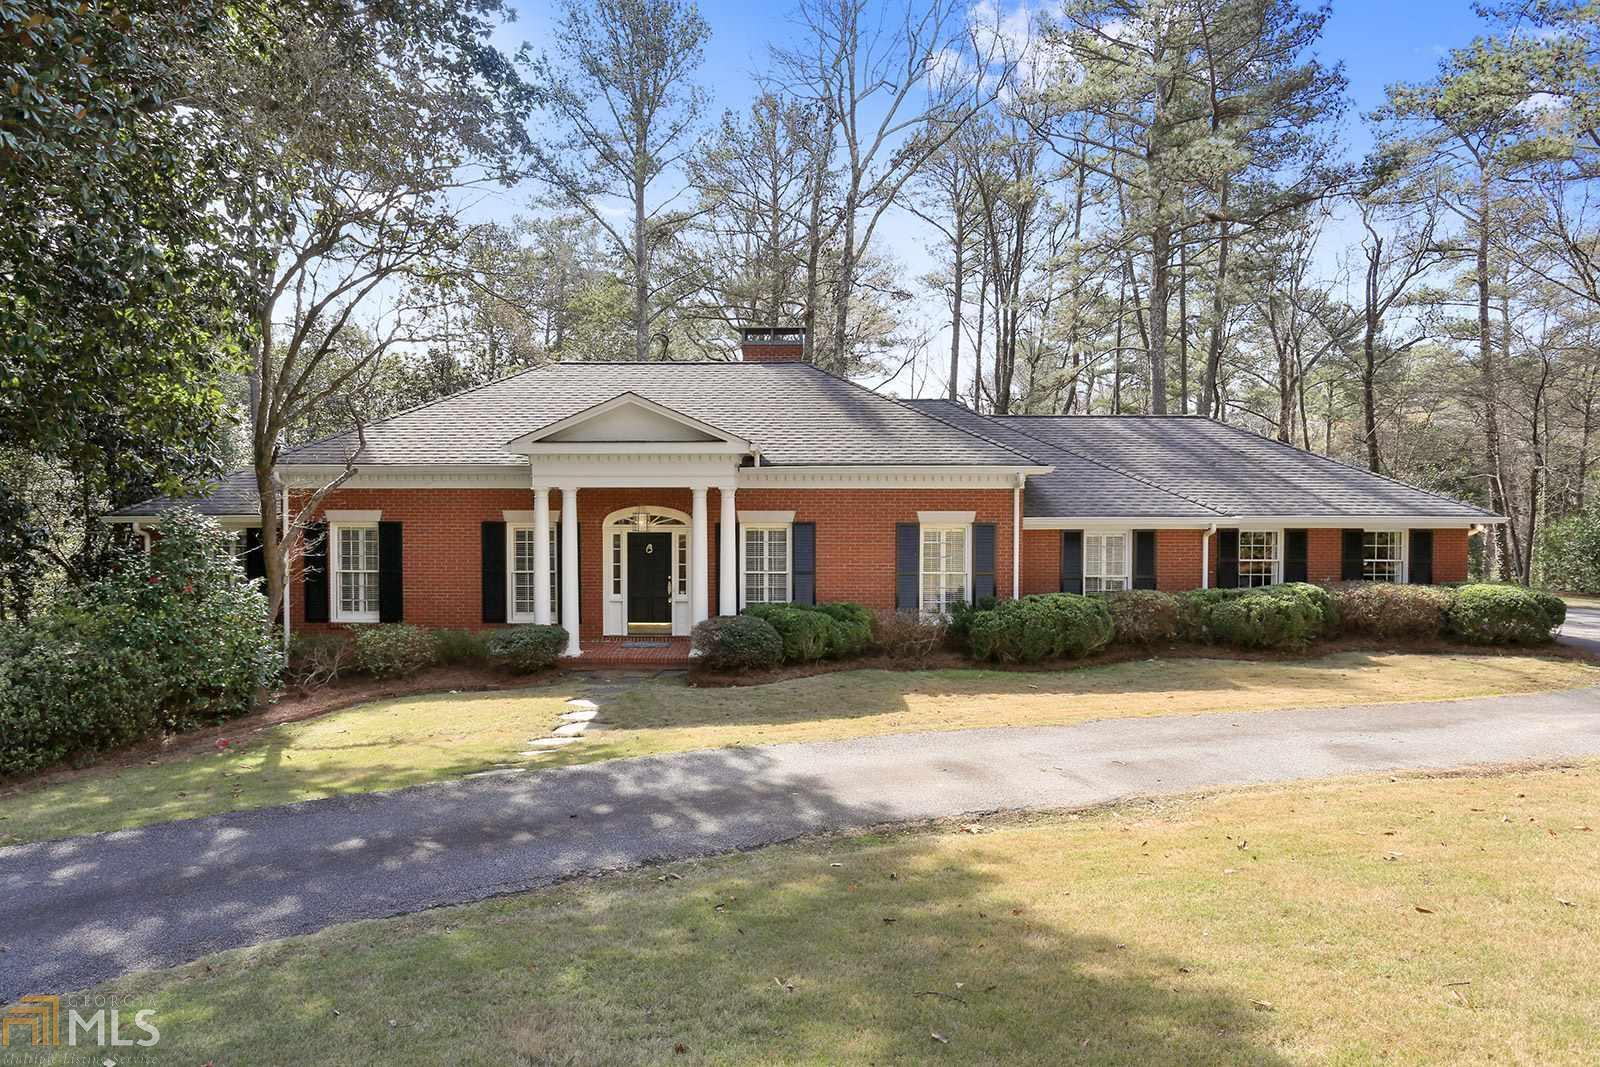 Better homes and gardens real estate atlanta better Atlanta home and garden